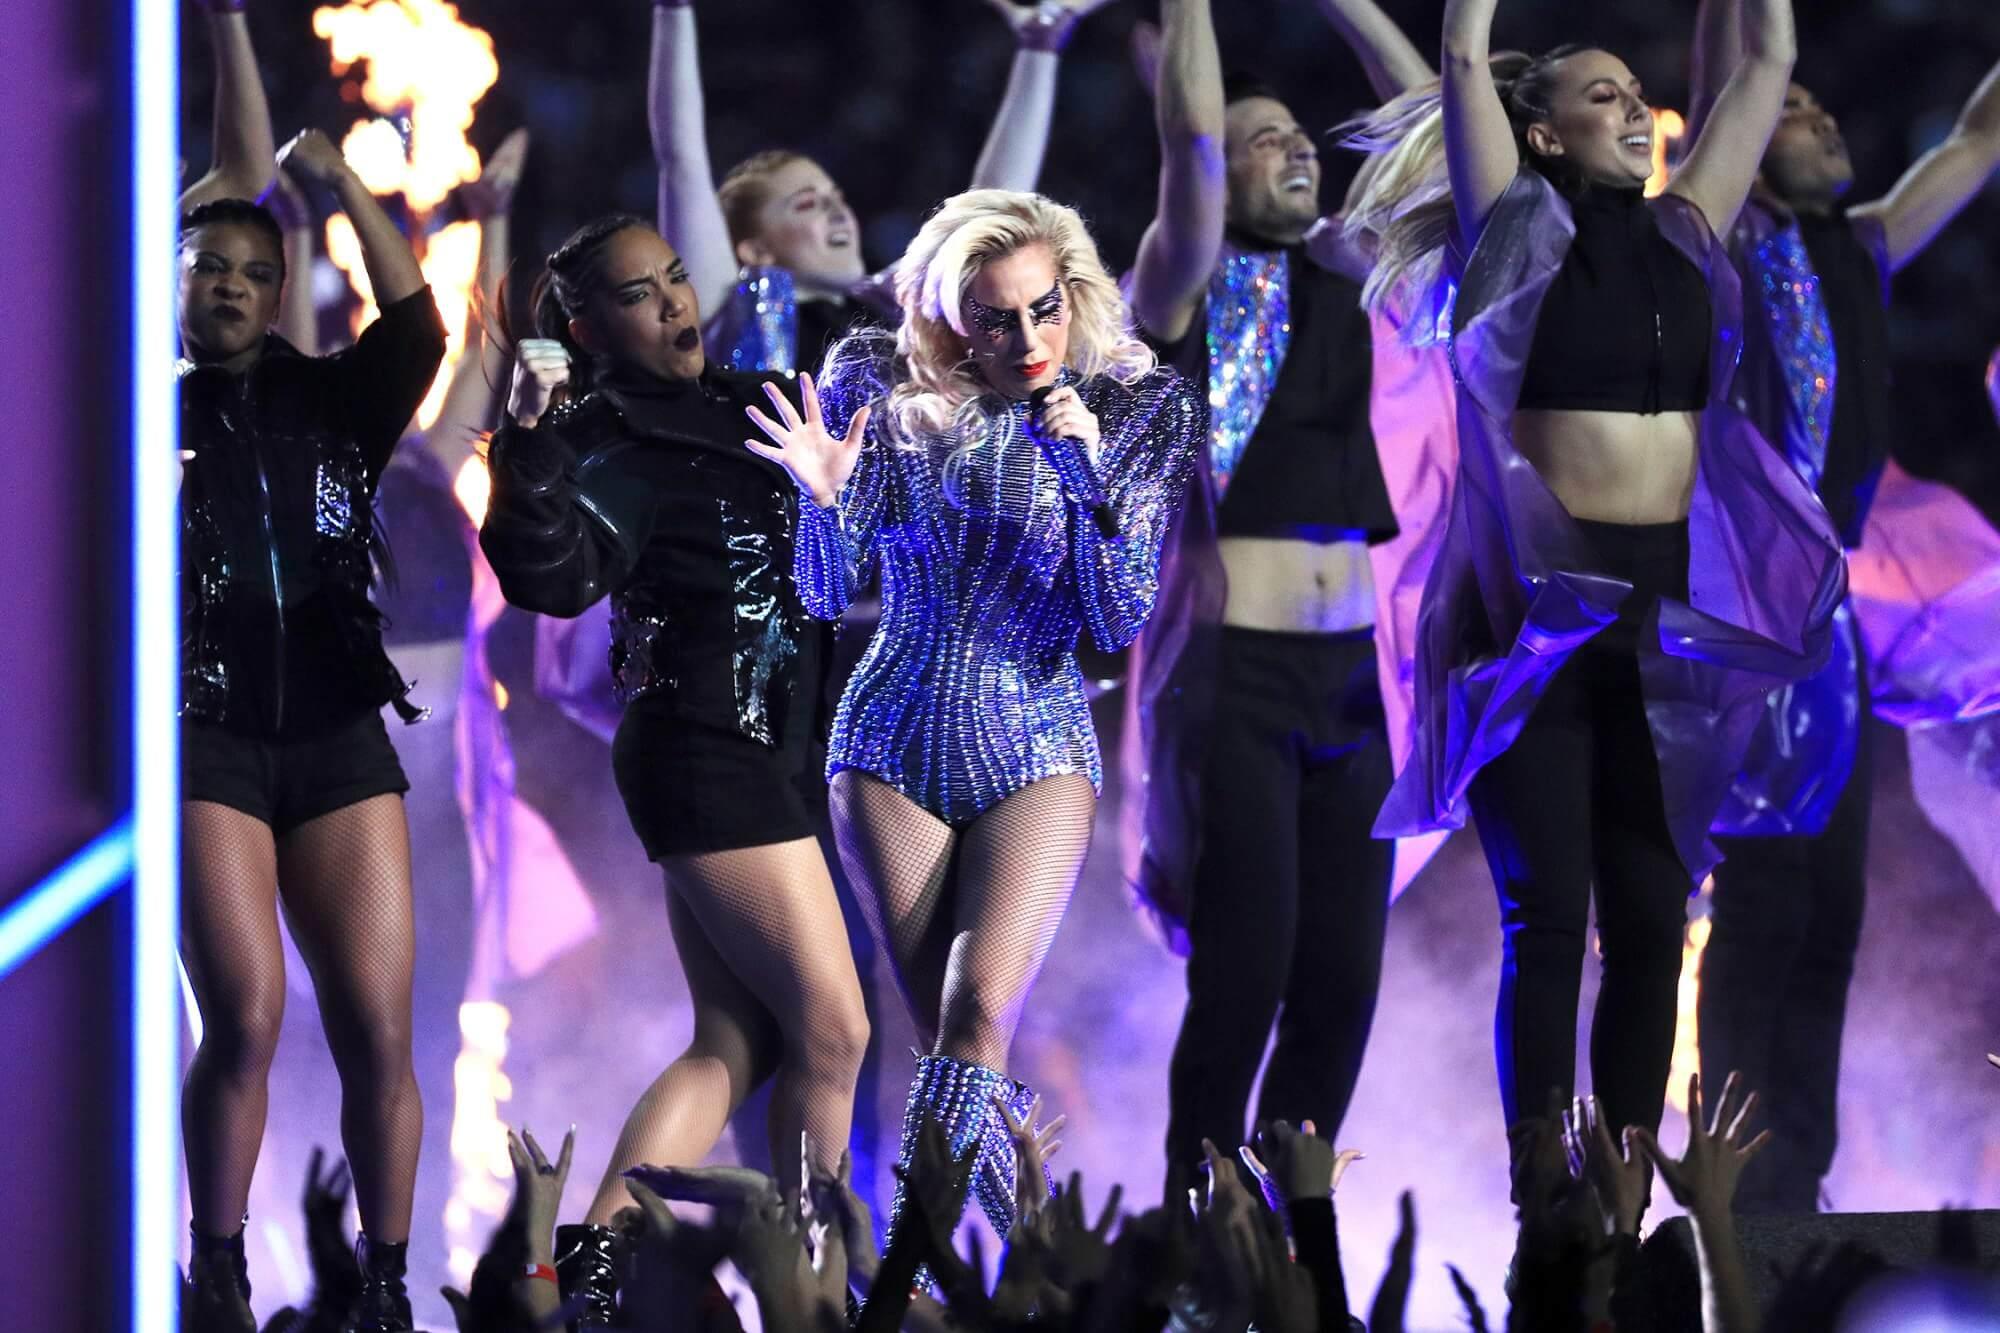 Lady Gaga Performing at the Super Bowl LI Halftime Show